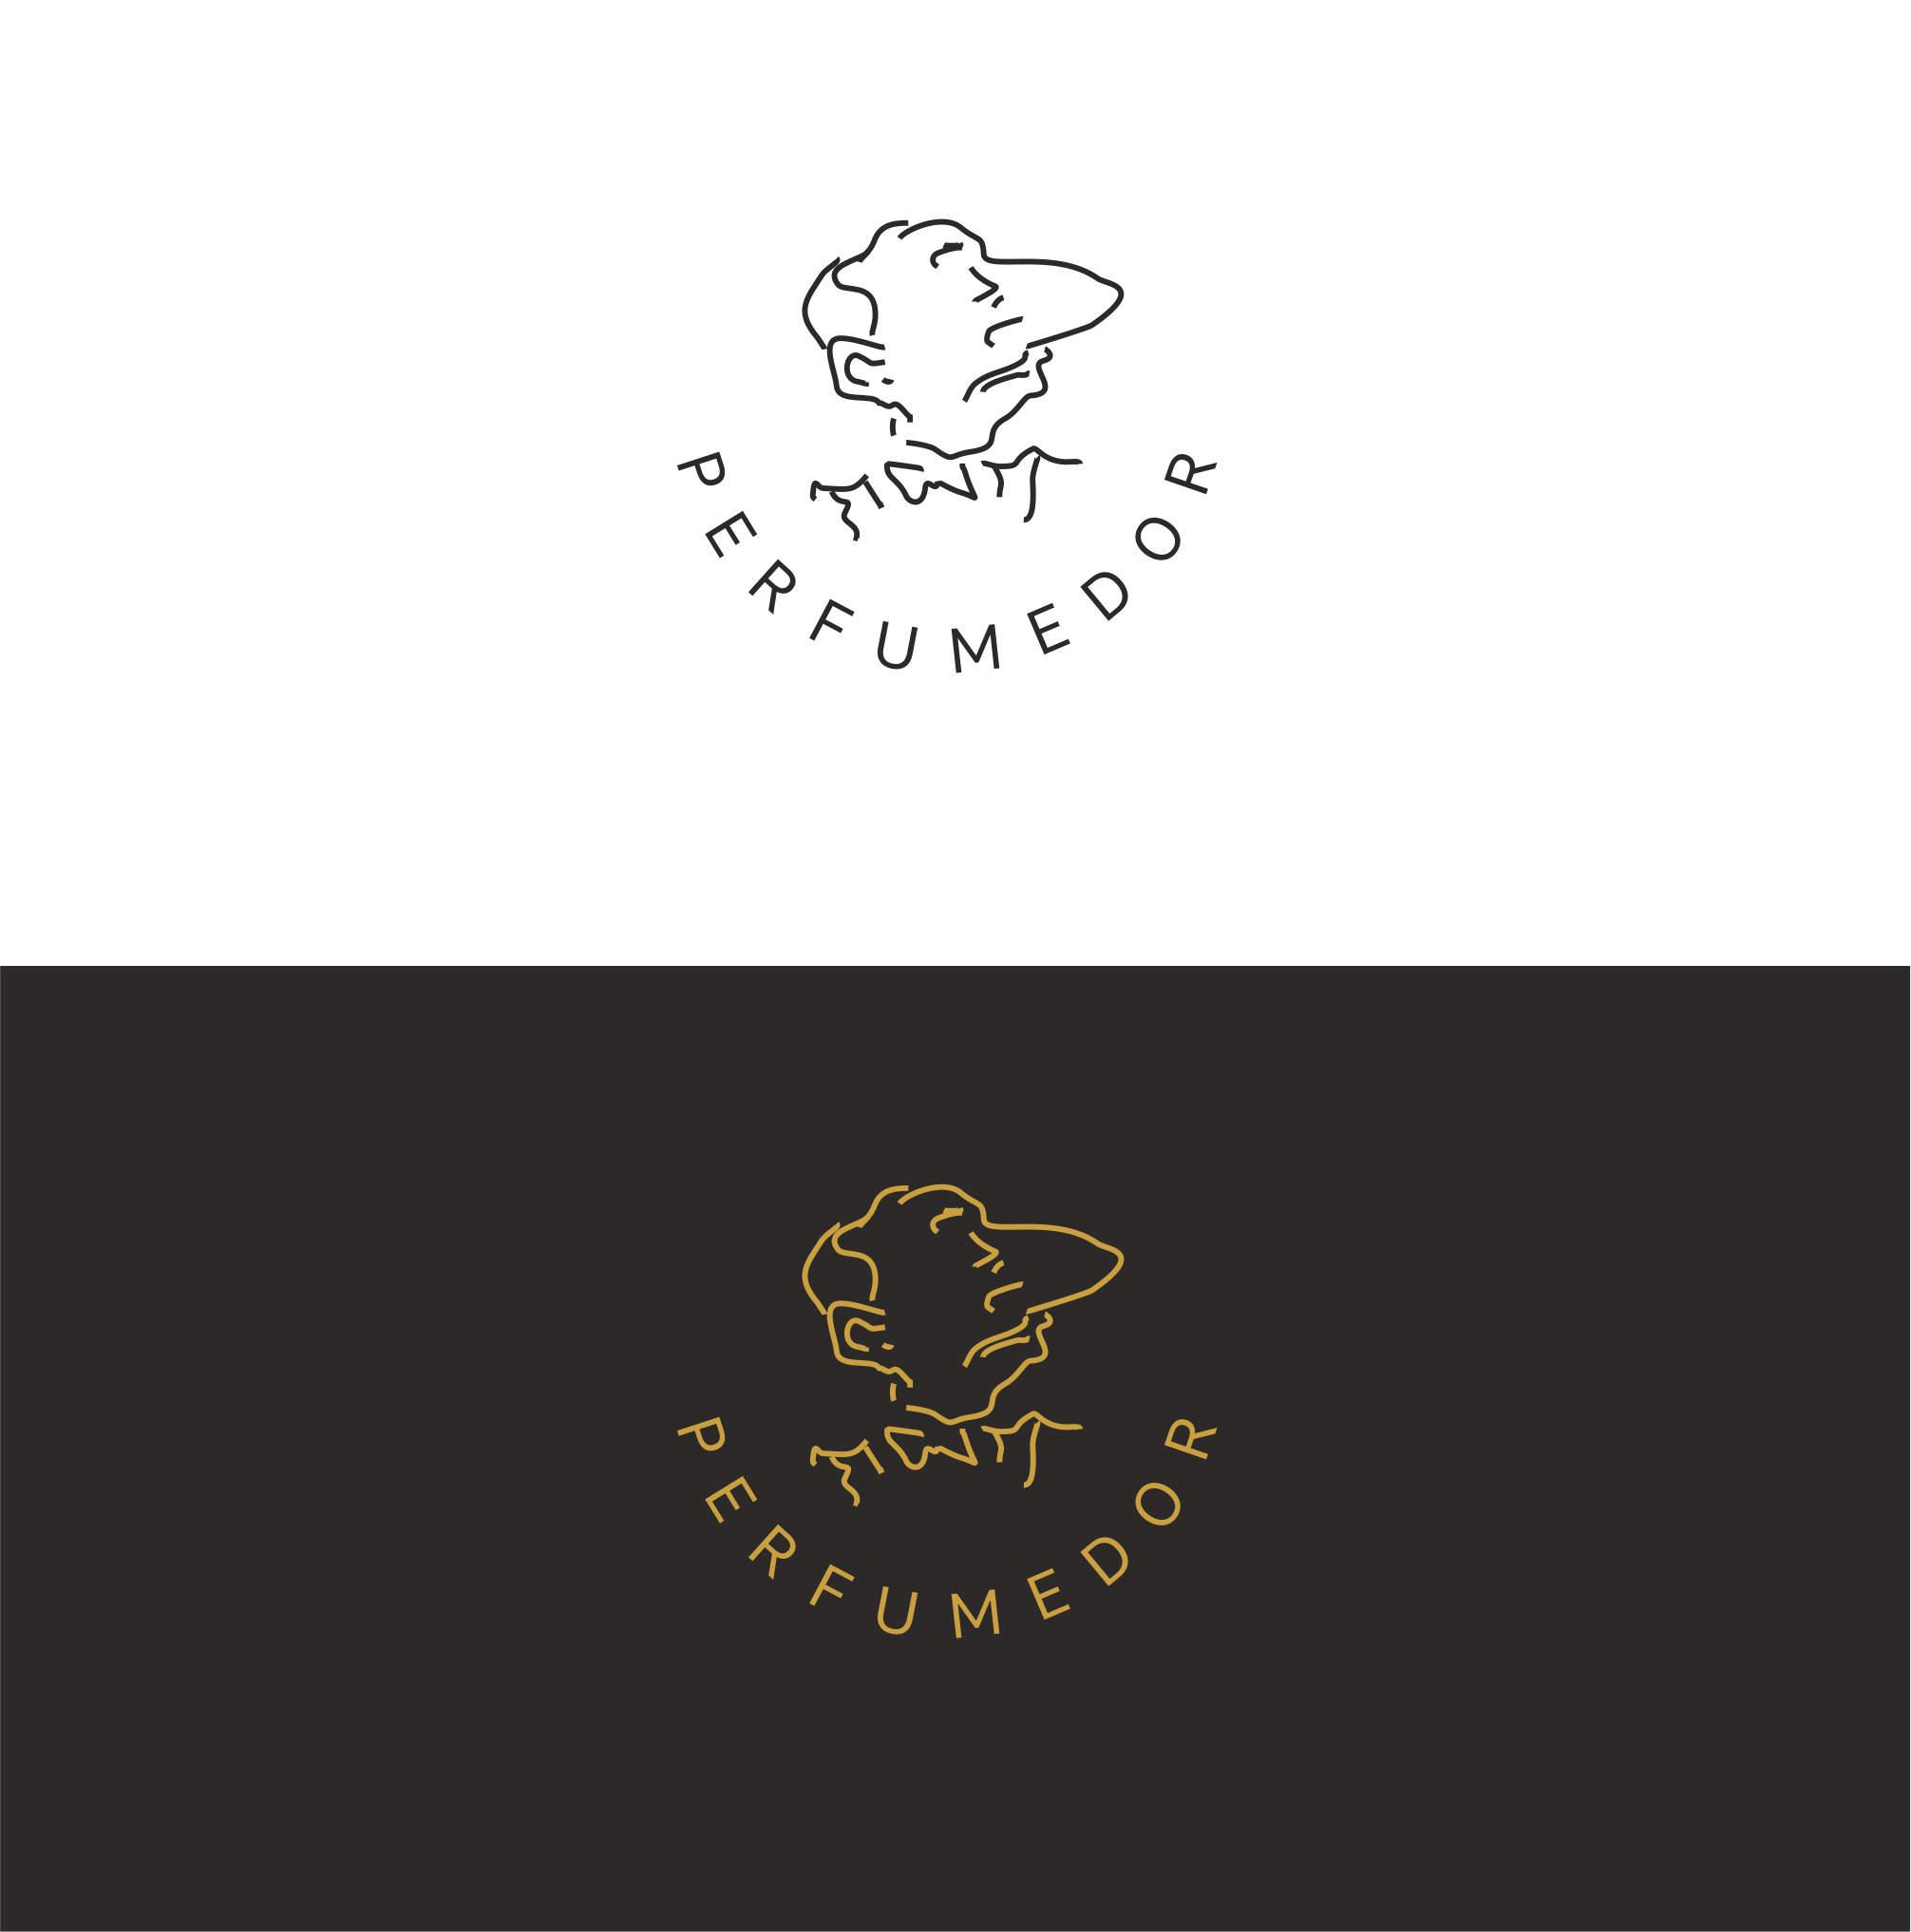 Логотип для интернет-магазина парфюмерии фото f_7495b4b808d5343a.jpg